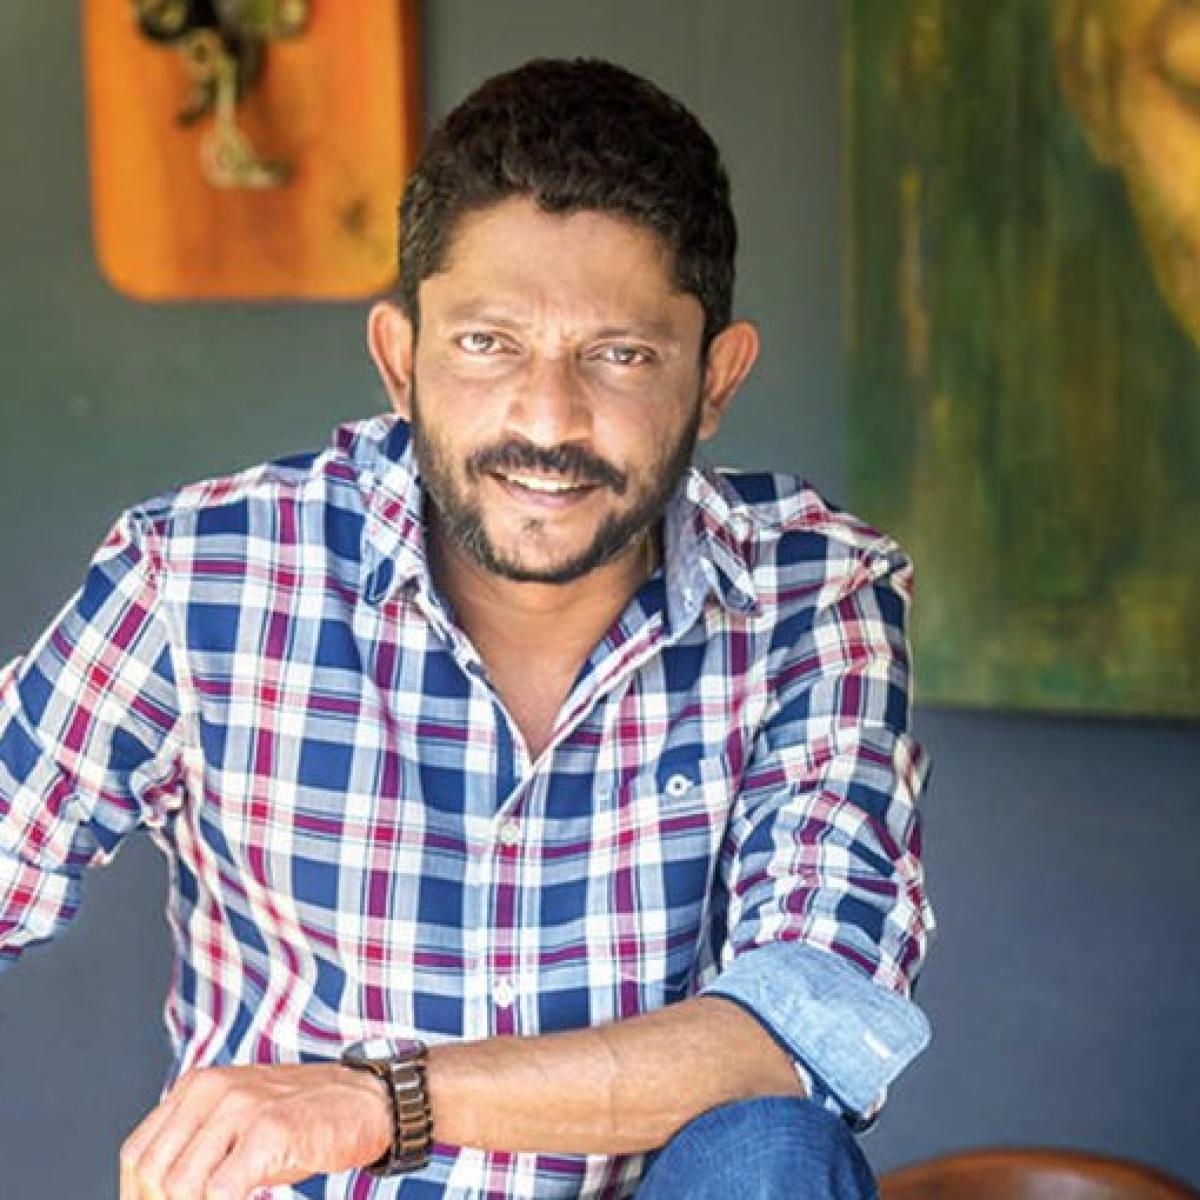 'Drishyam' director Nishikant Kamat has passed away, confirms Riteish Deshmukh